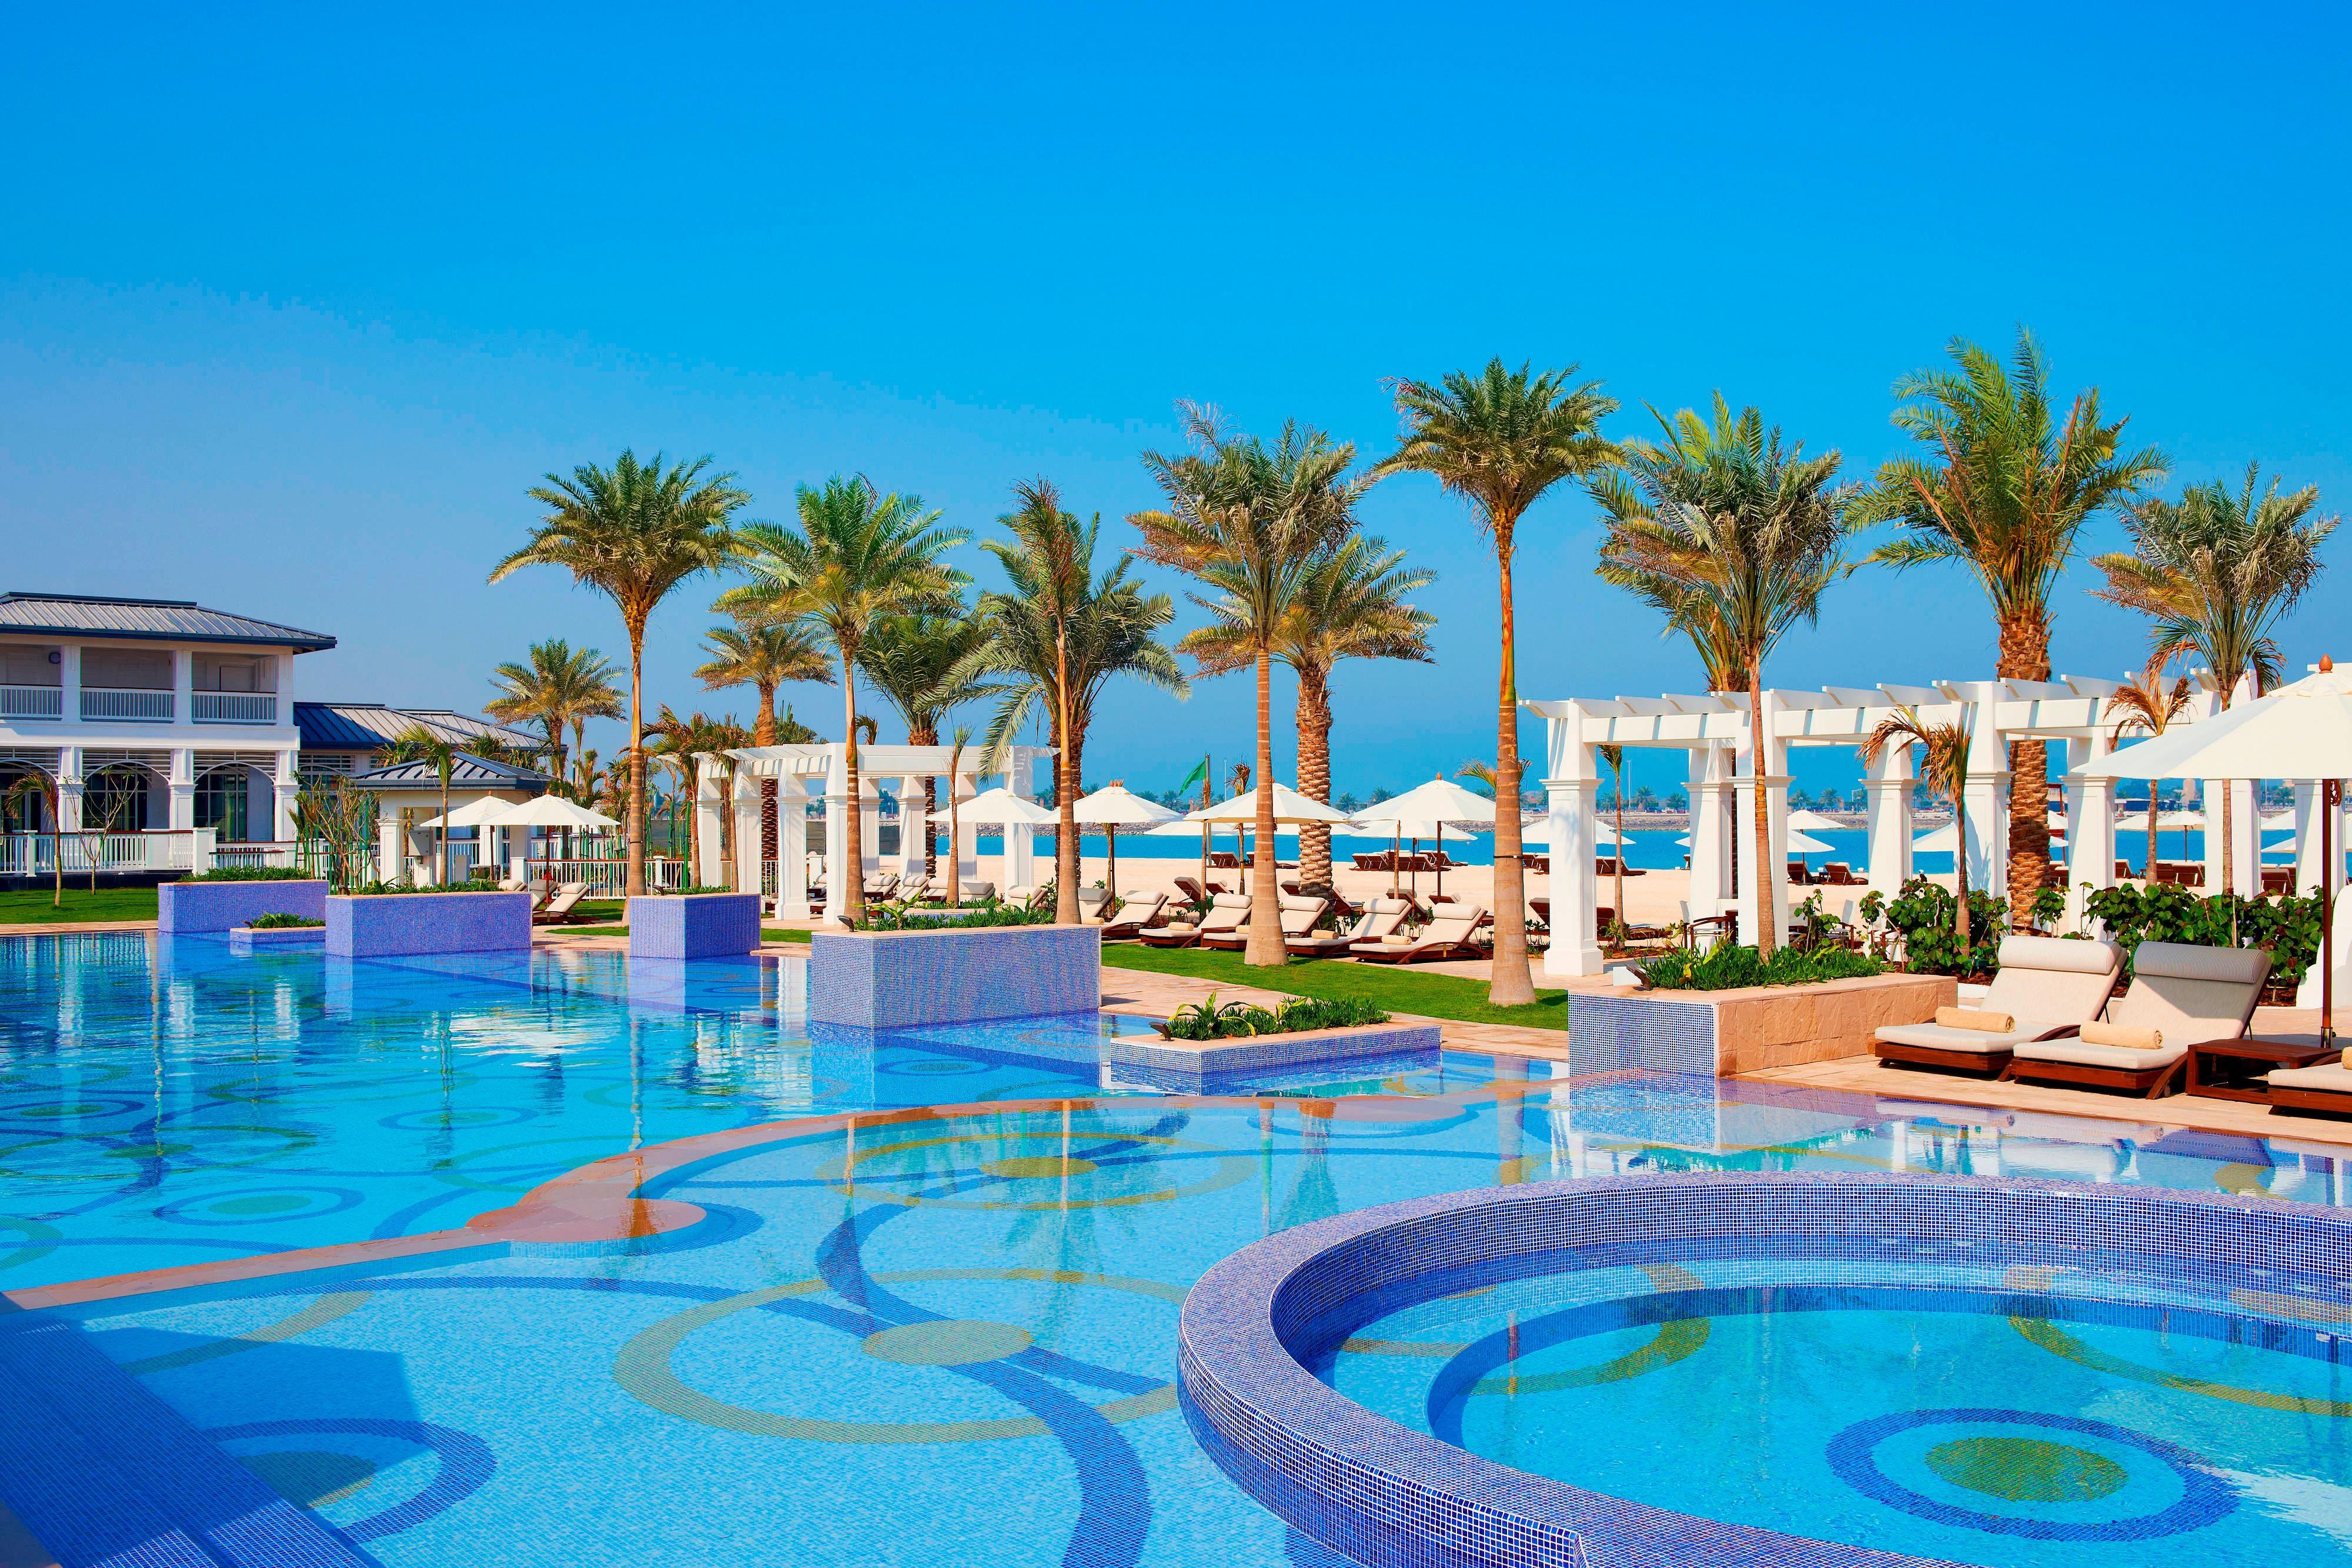 Nation Riviera Beach Club - Swimming Pool